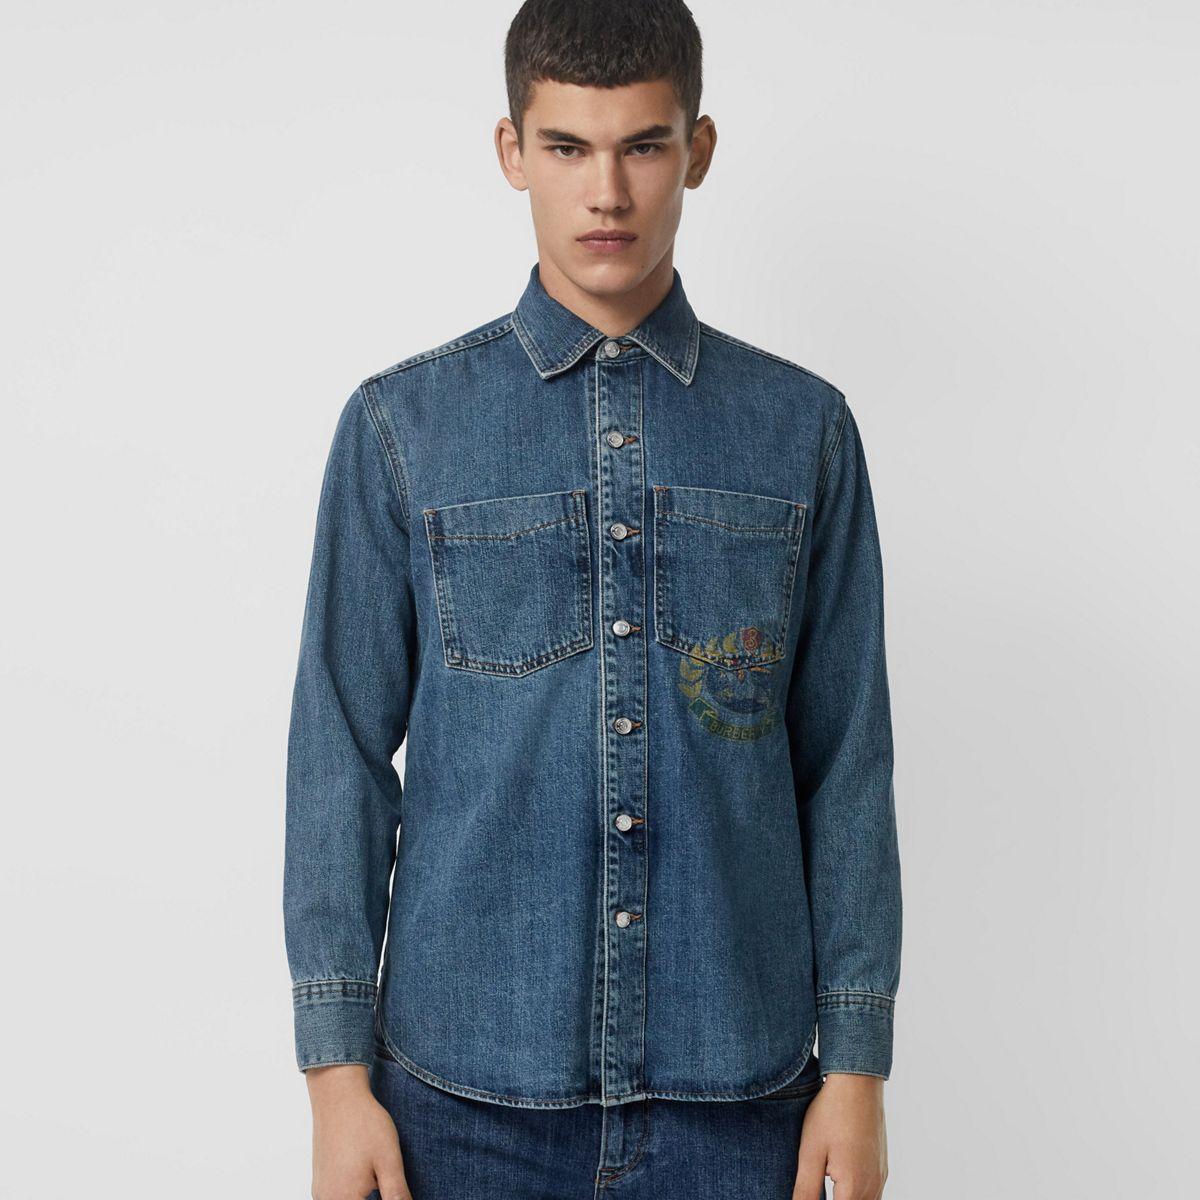 8cc3a95584 Lyst - Burberry Crest Print Denim Overshirt in Blue for Men